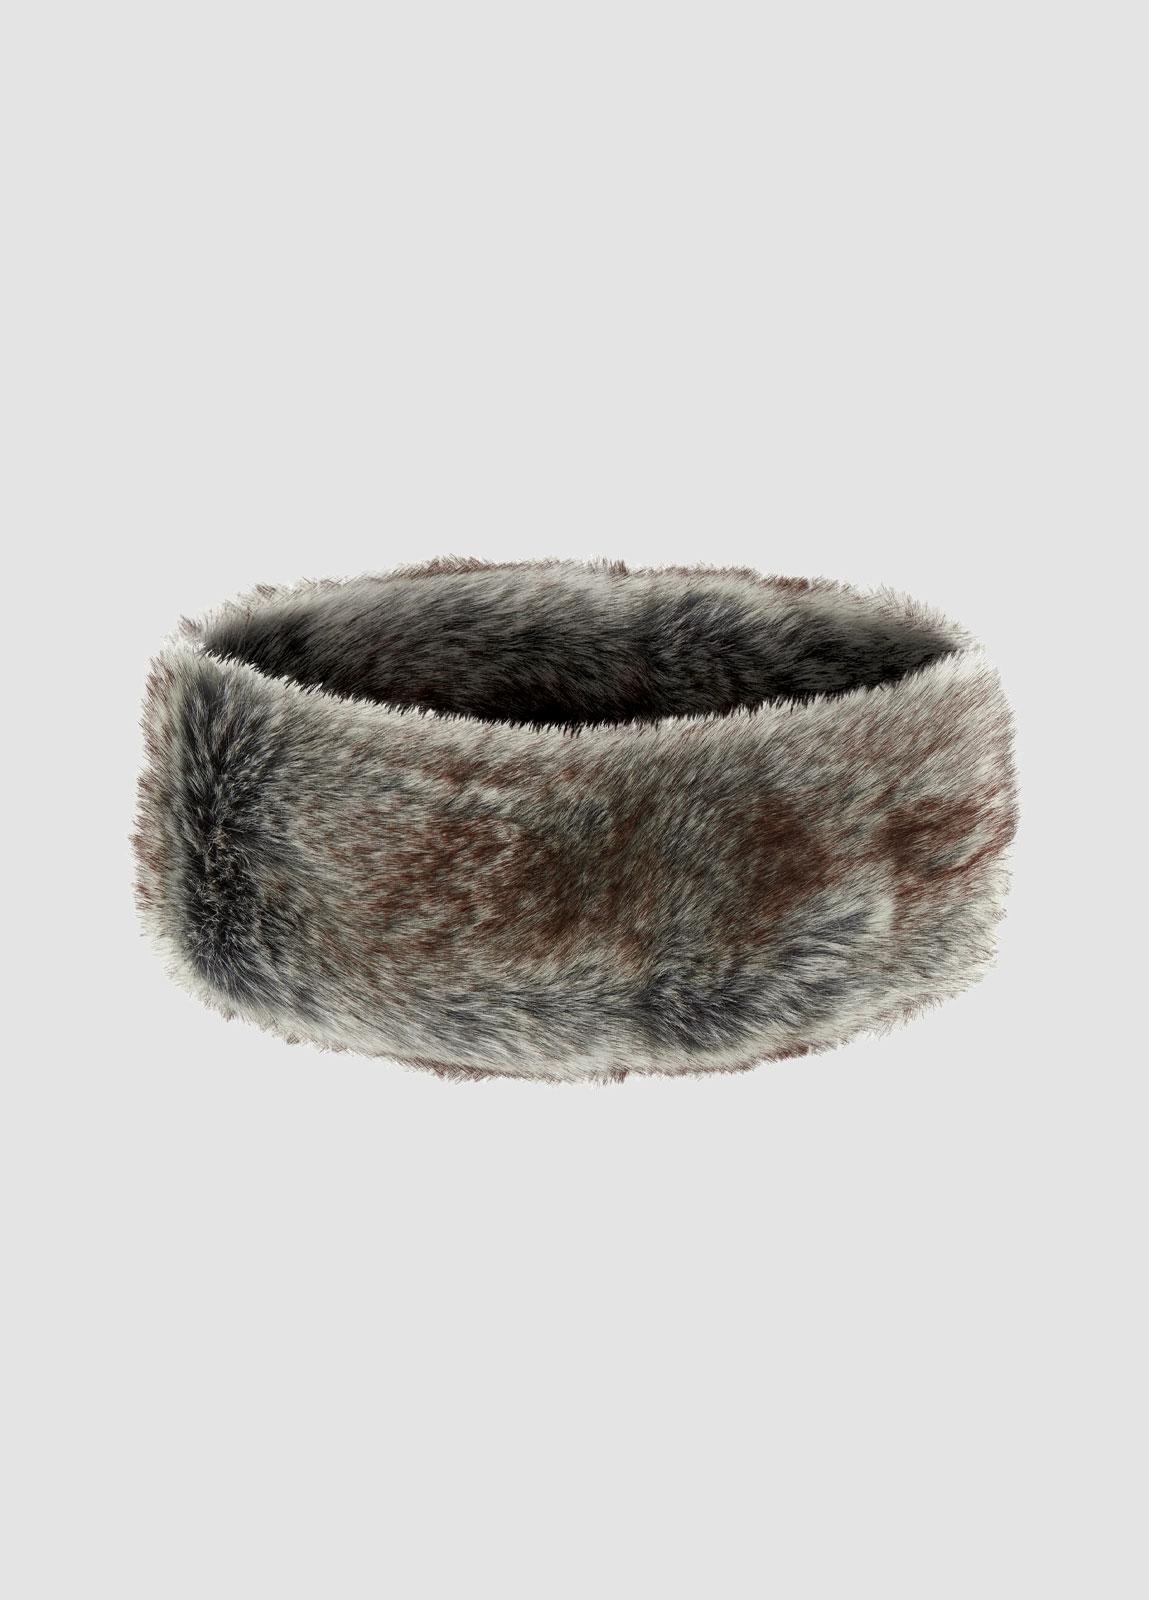 Faux Fur Headband - Sable